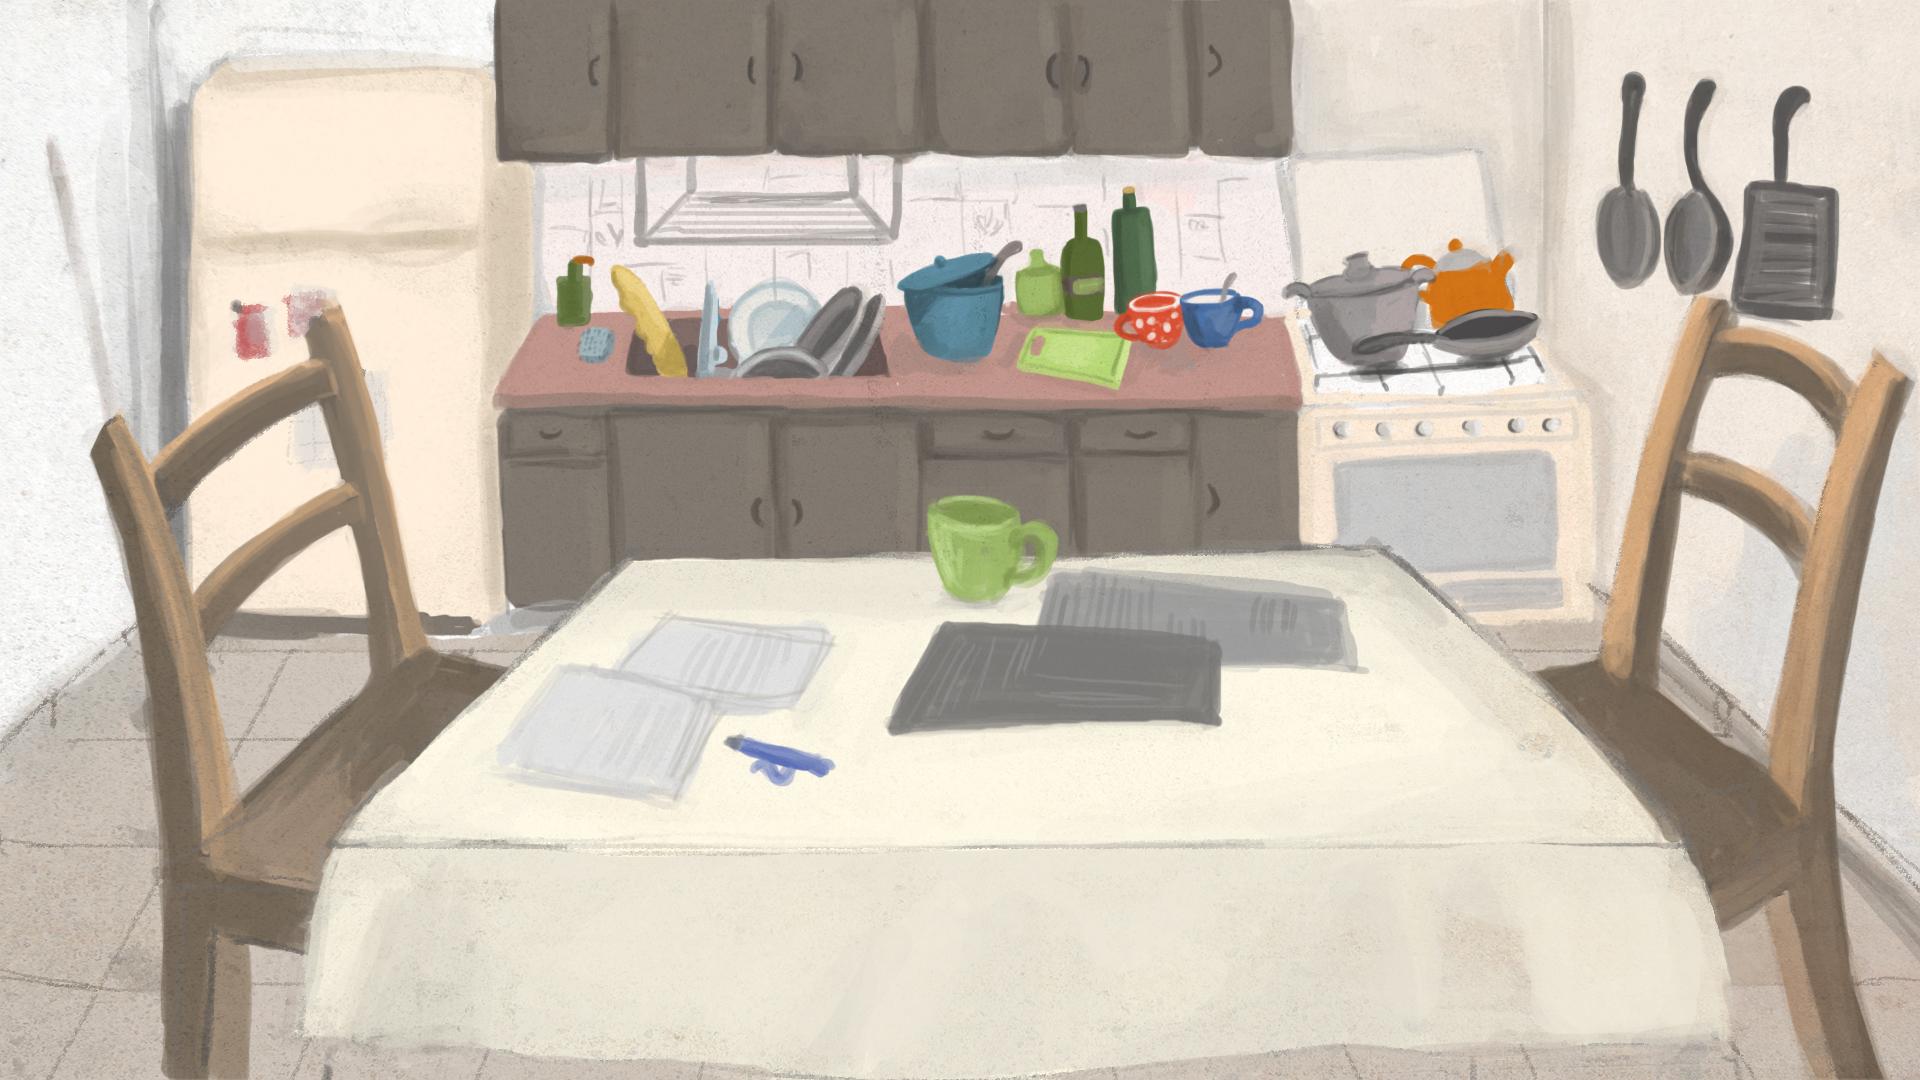 Bkg For Animation #3